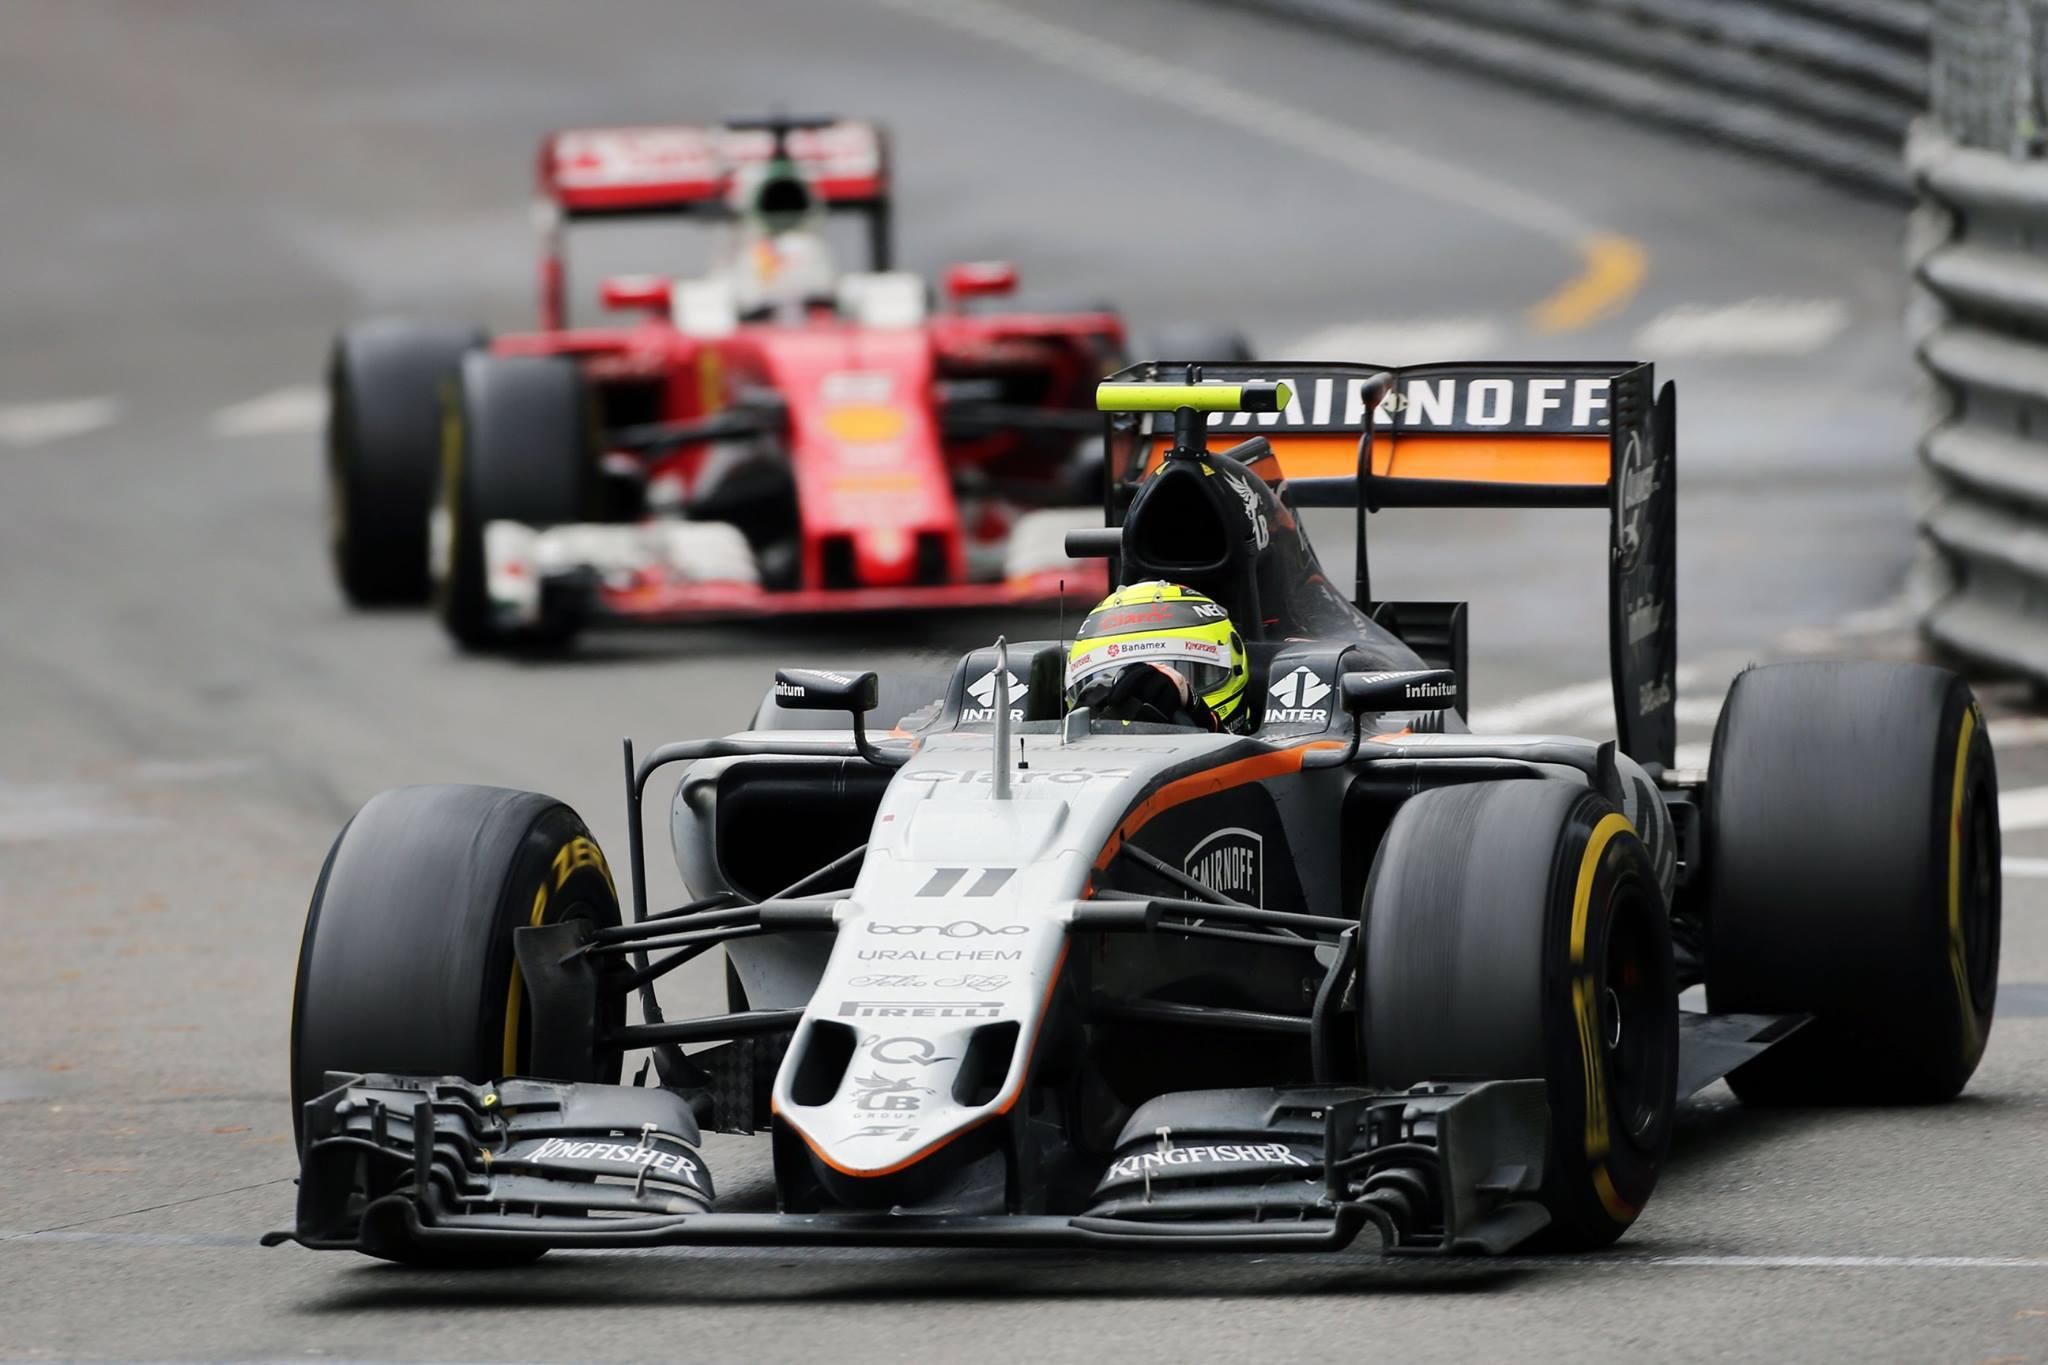 Monaco_domingo_2016_racef1 (3)